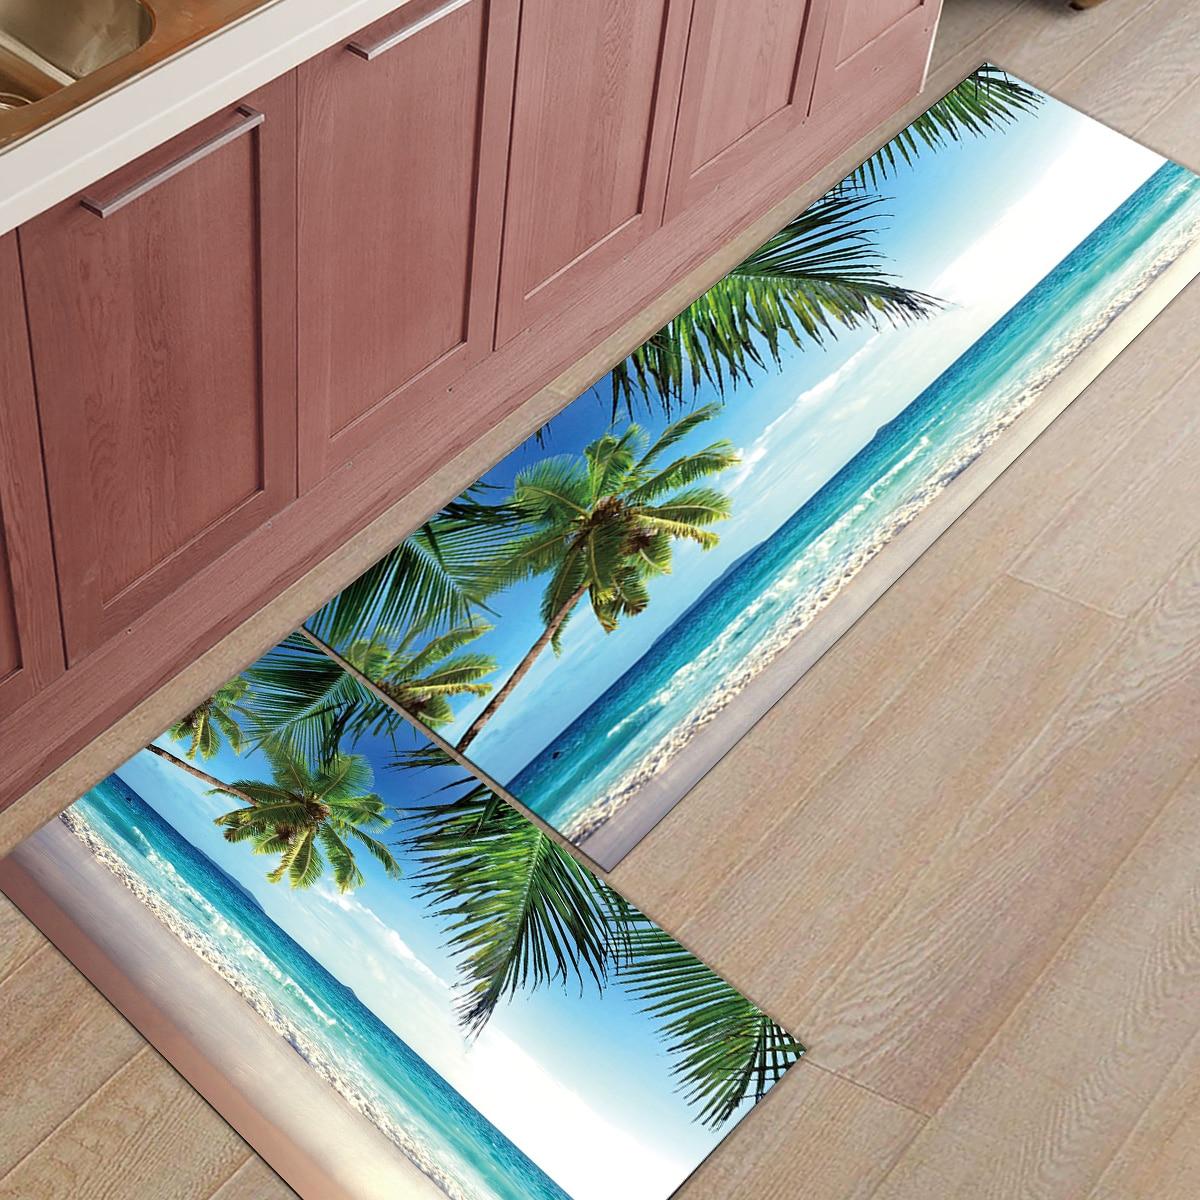 Beach Coconut Tree Wave Sky  Doormats For Entrance Way Bathroom Accessories Set Dirt Debris Mud Trapper Boot Shoes Scraper AreaBeach Coconut Tree Wave Sky  Doormats For Entrance Way Bathroom Accessories Set Dirt Debris Mud Trapper Boot Shoes Scraper Area